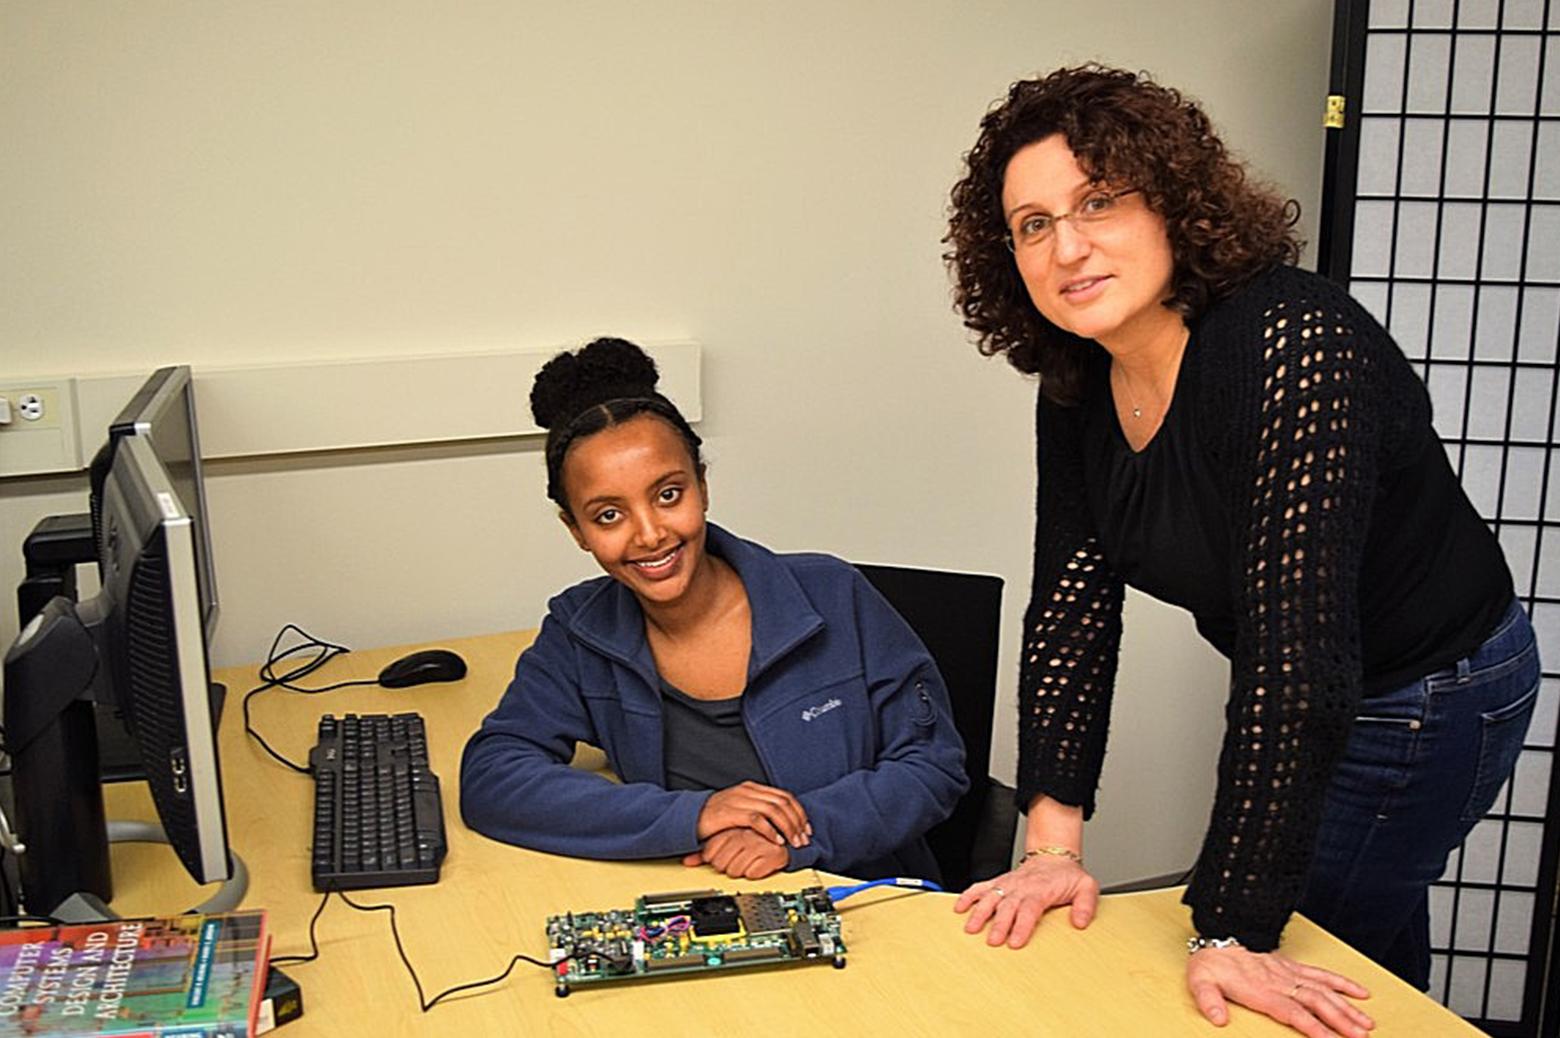 Hiwot Kassa and her advisor Prof. Valeria Bertacco